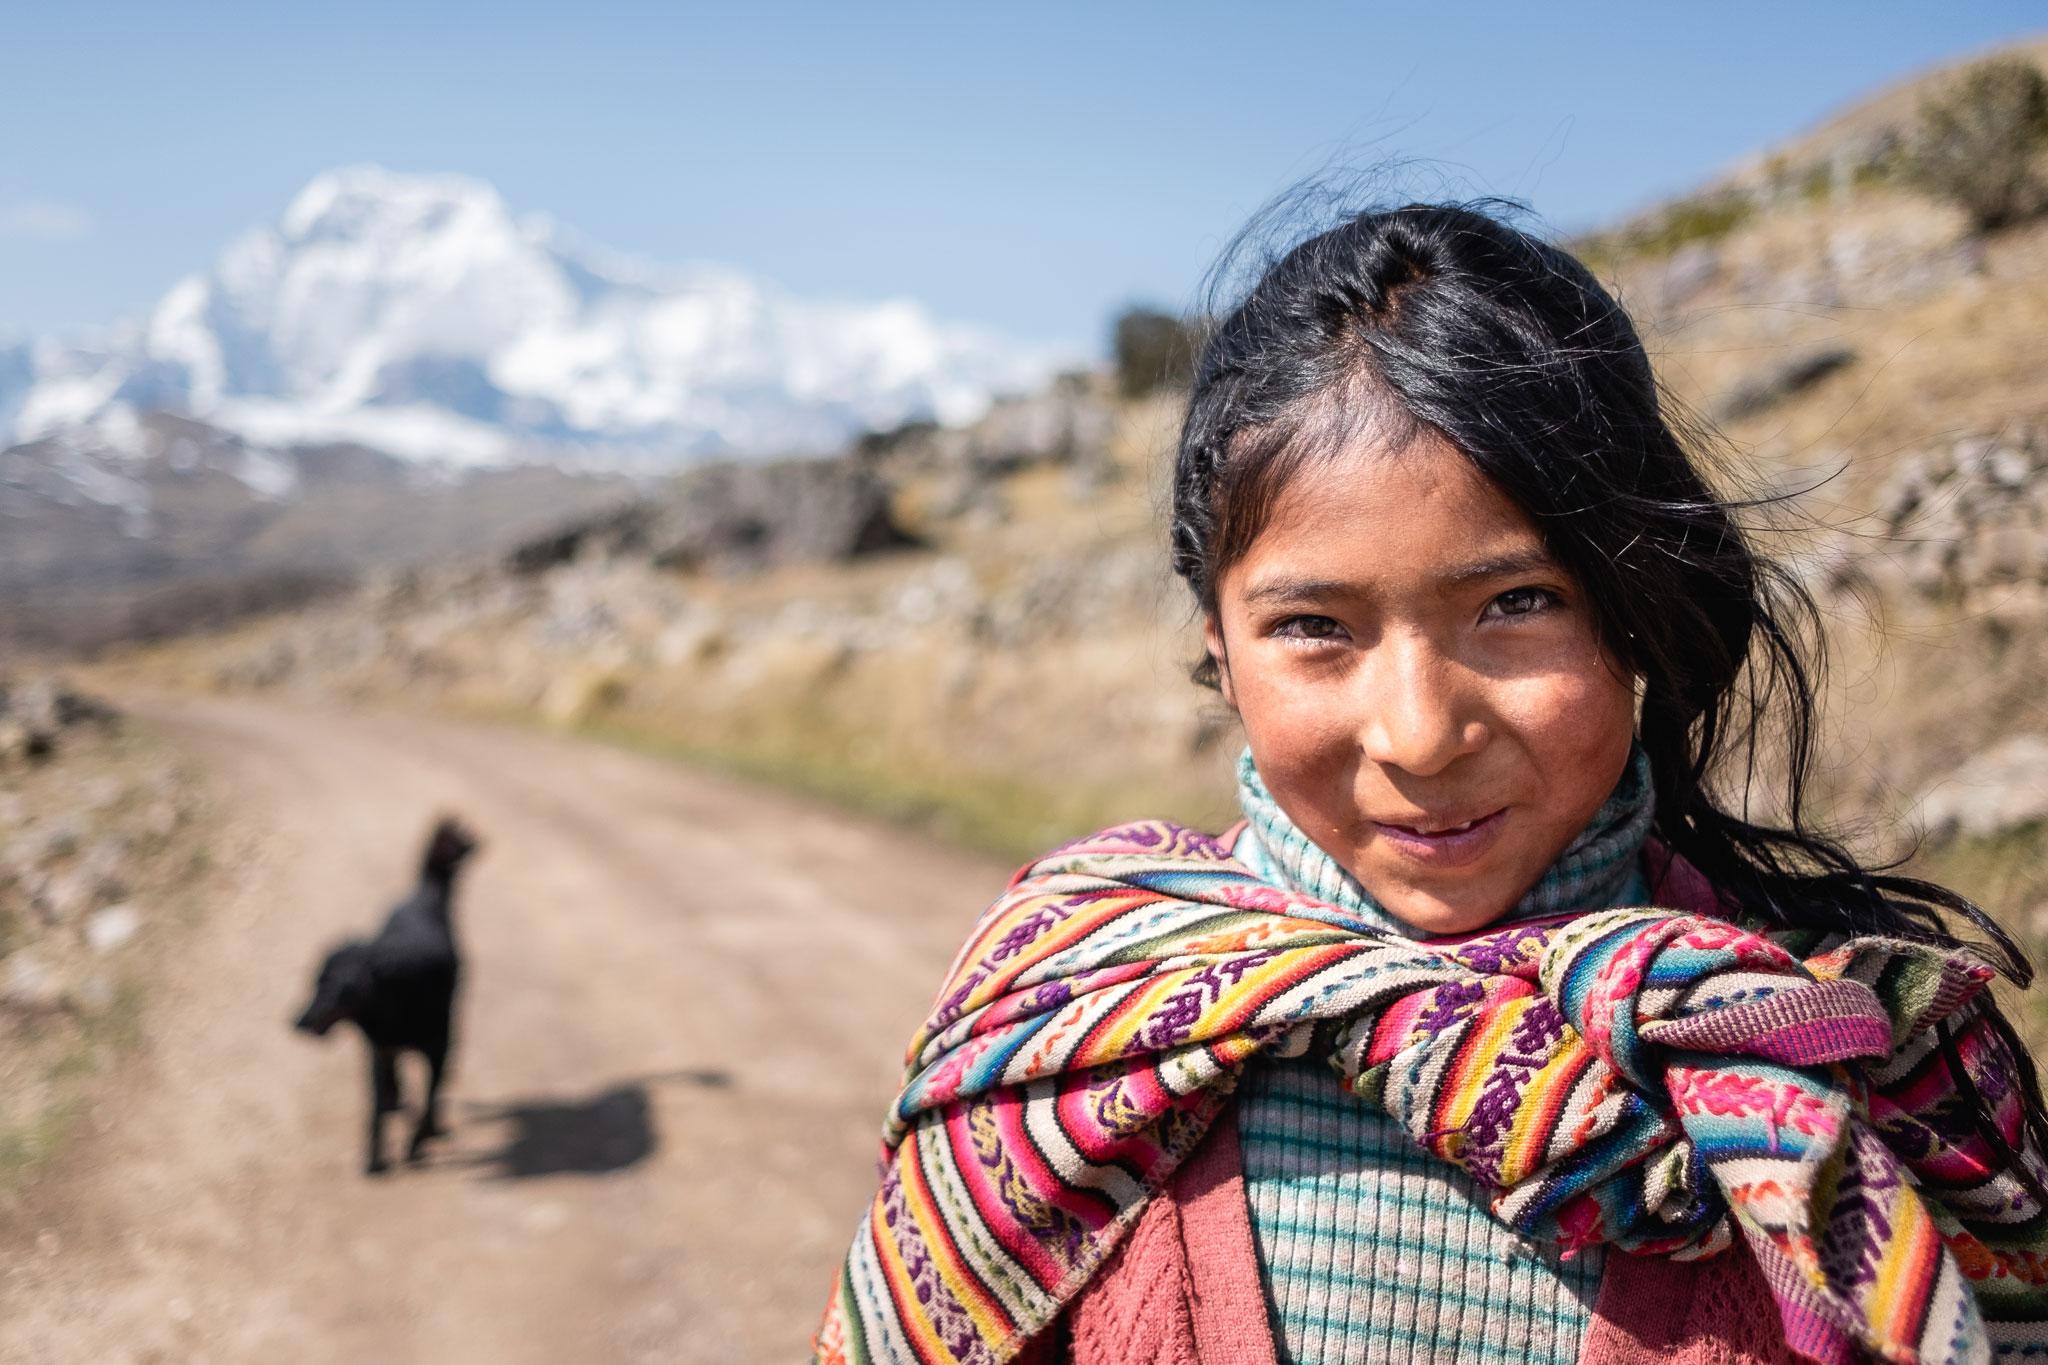 QUECHUA GIRL GOING TO SCHOOL